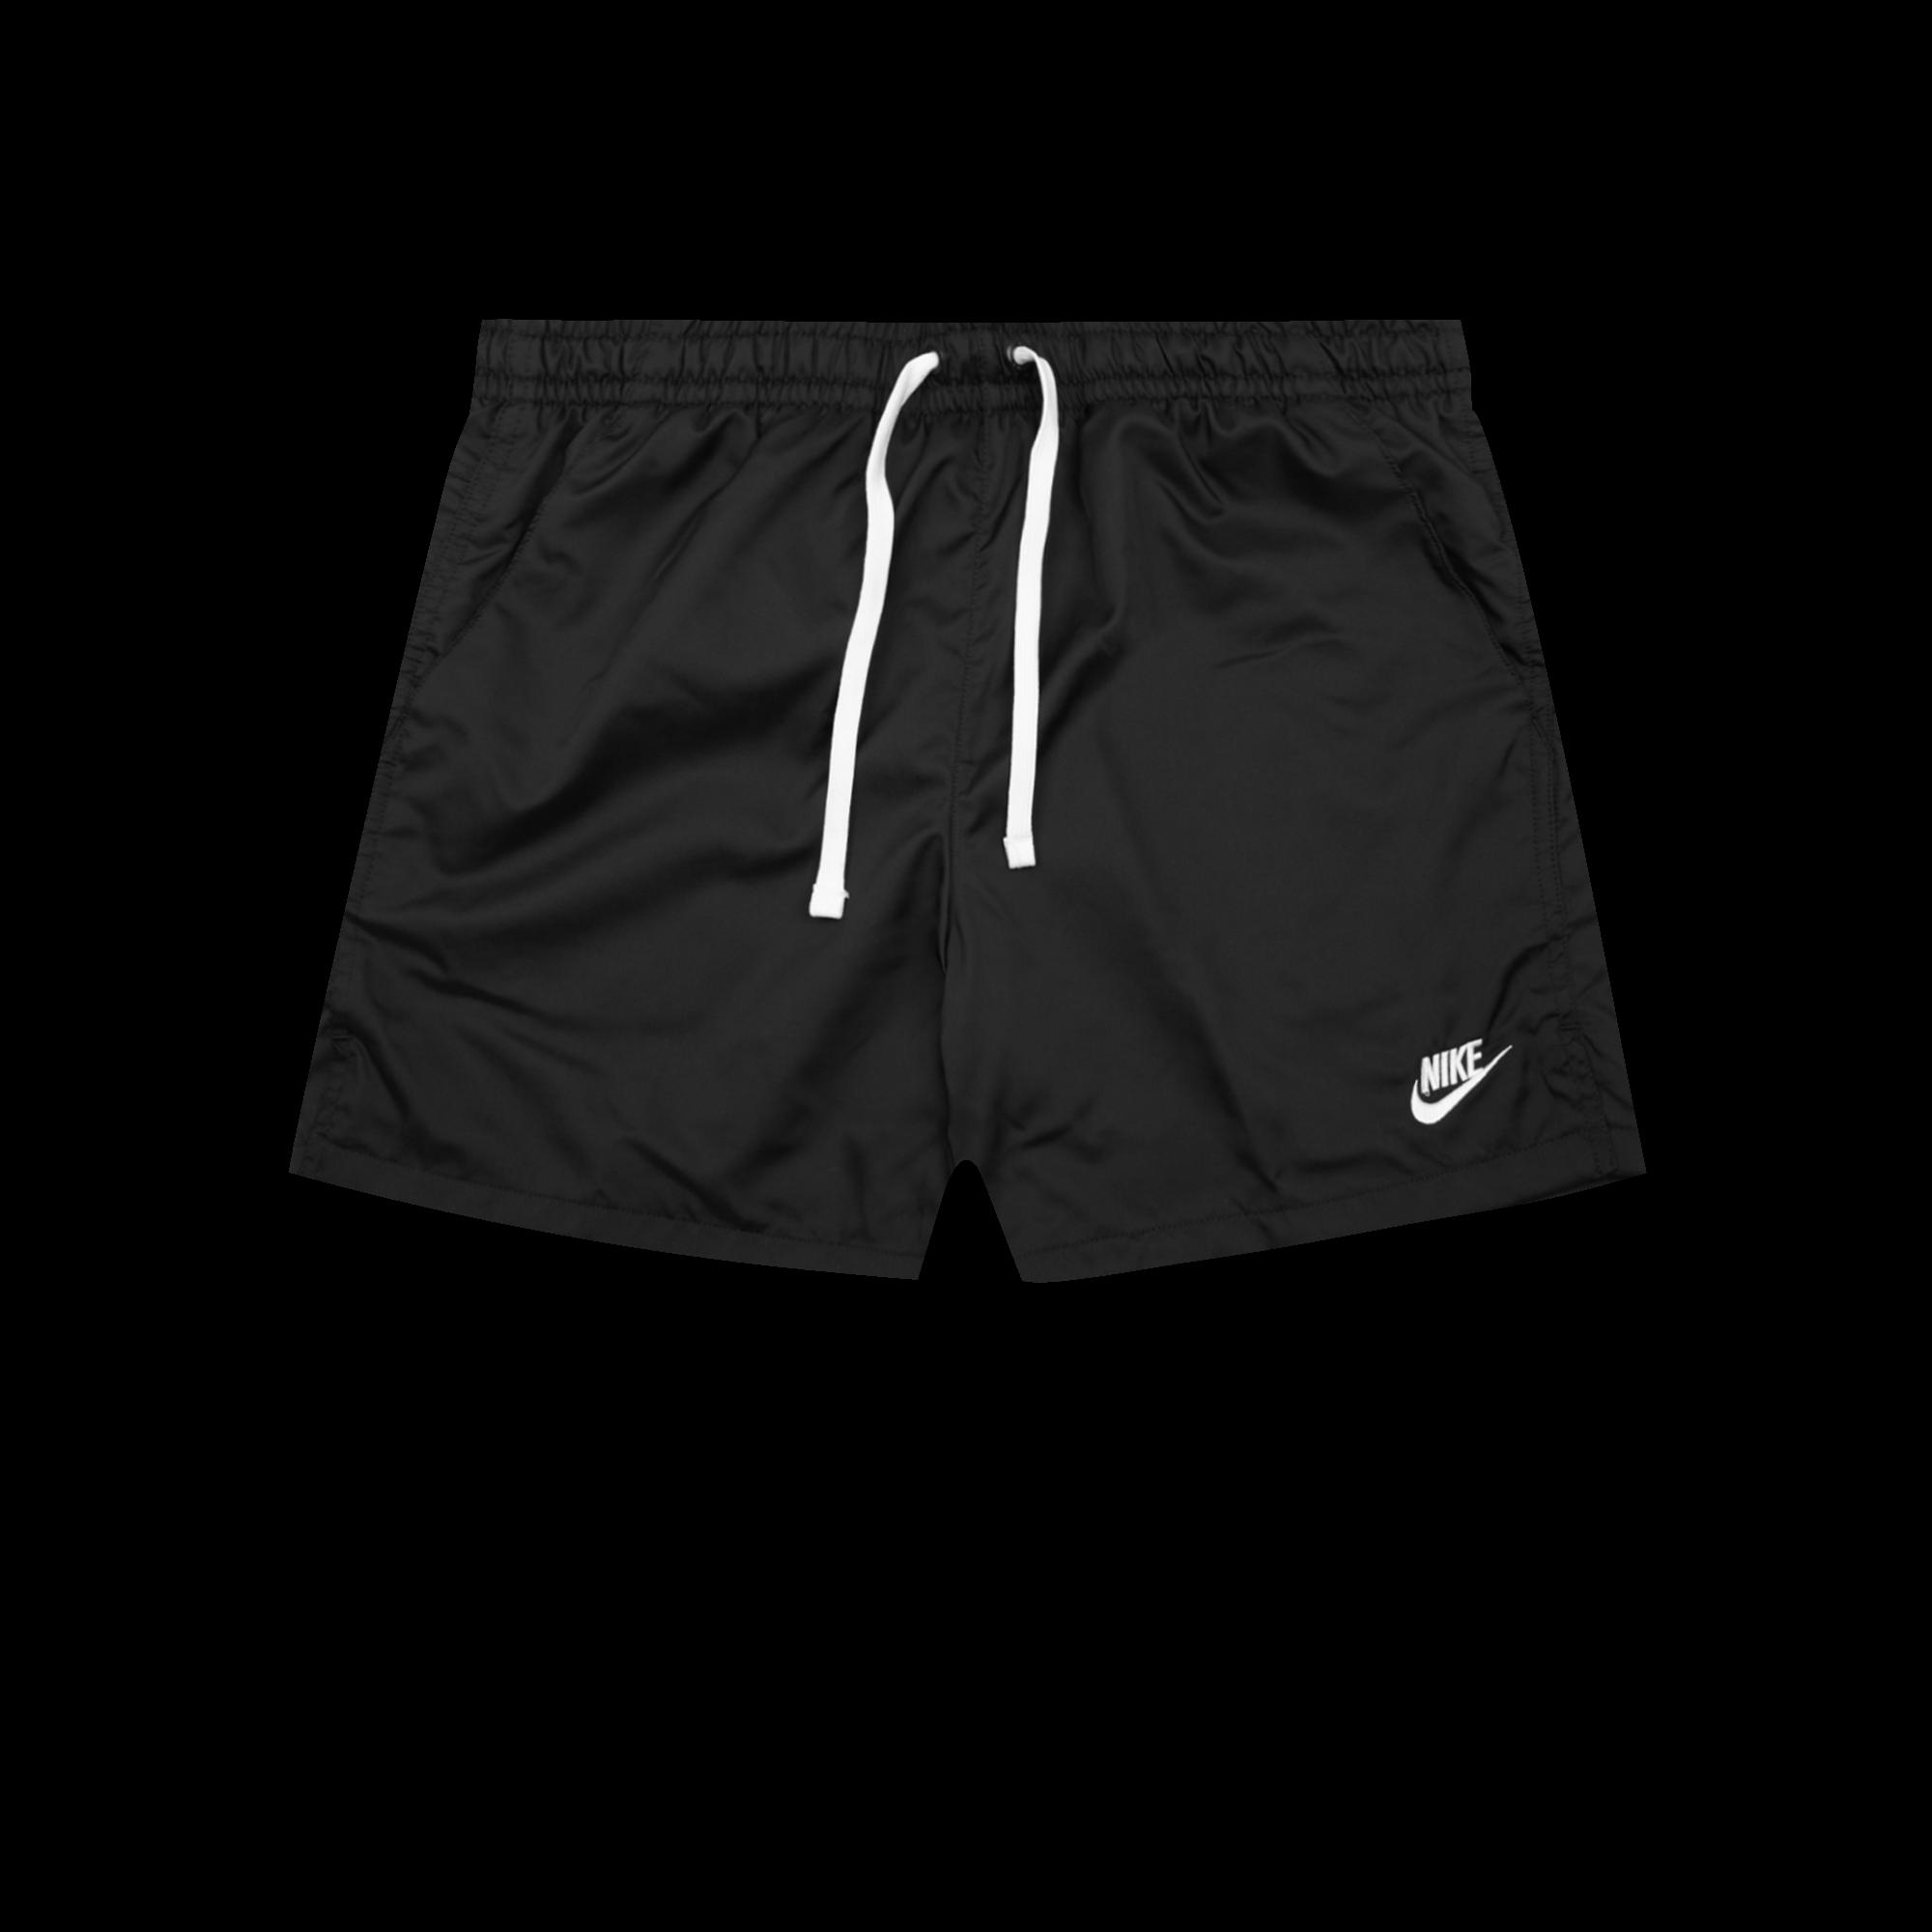 Nike NSW Short Flow black white Pantaloni corti |